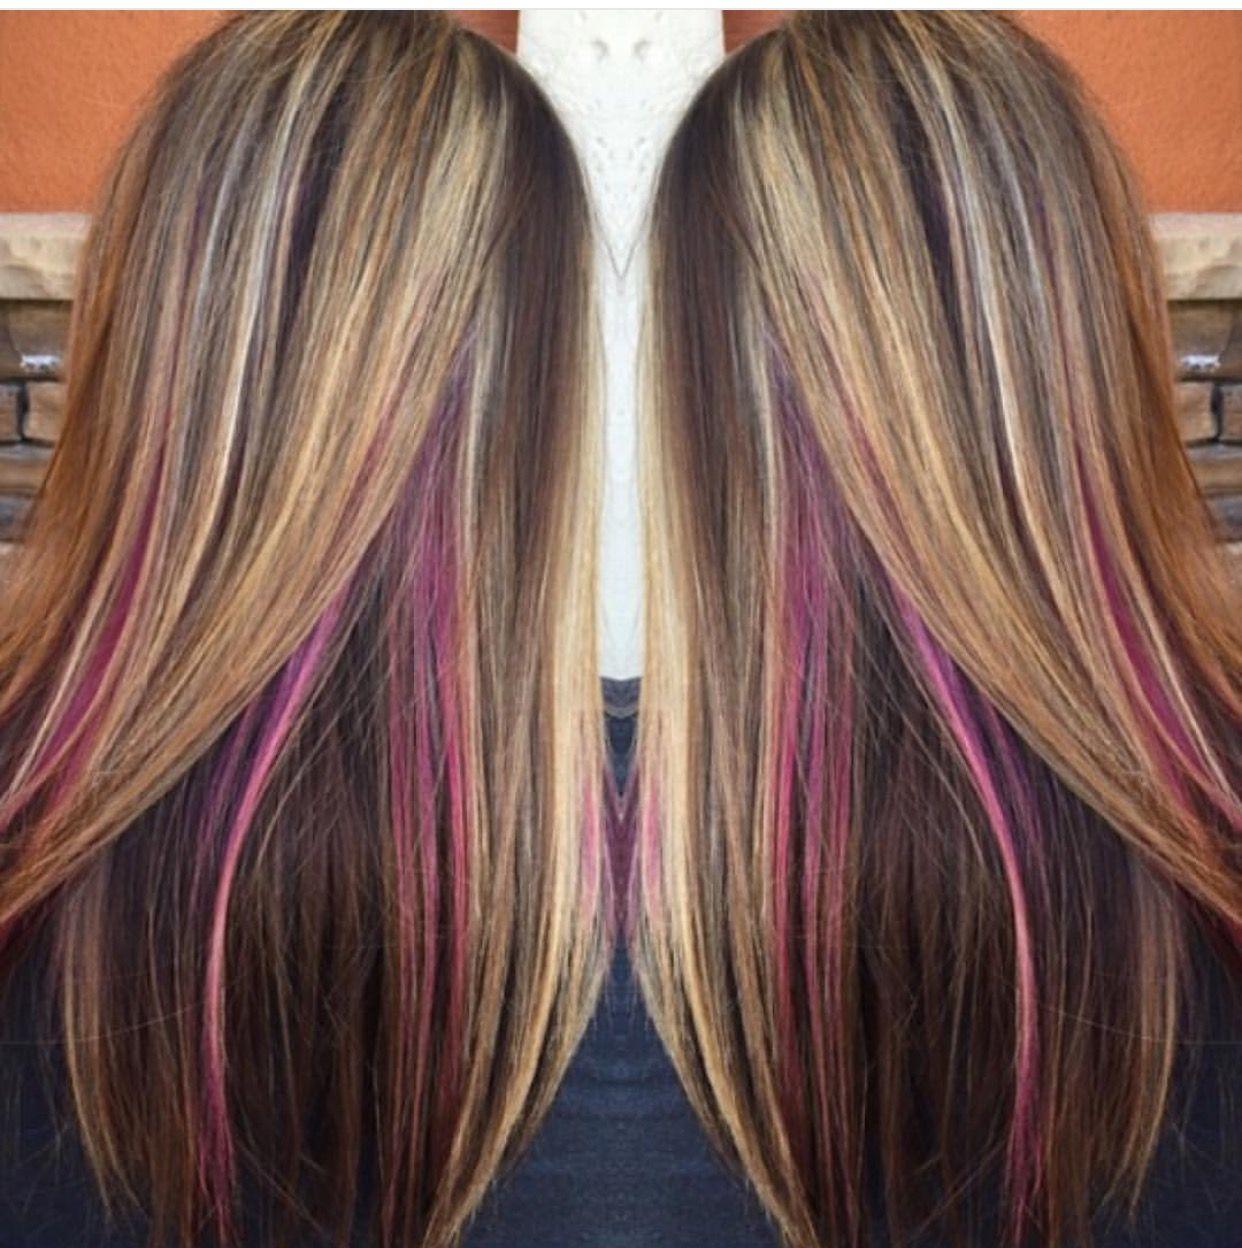 Pin By Kim Aiken On Hair Underlights Hair Peekaboo Hair Brunette Hair Color With Highlights